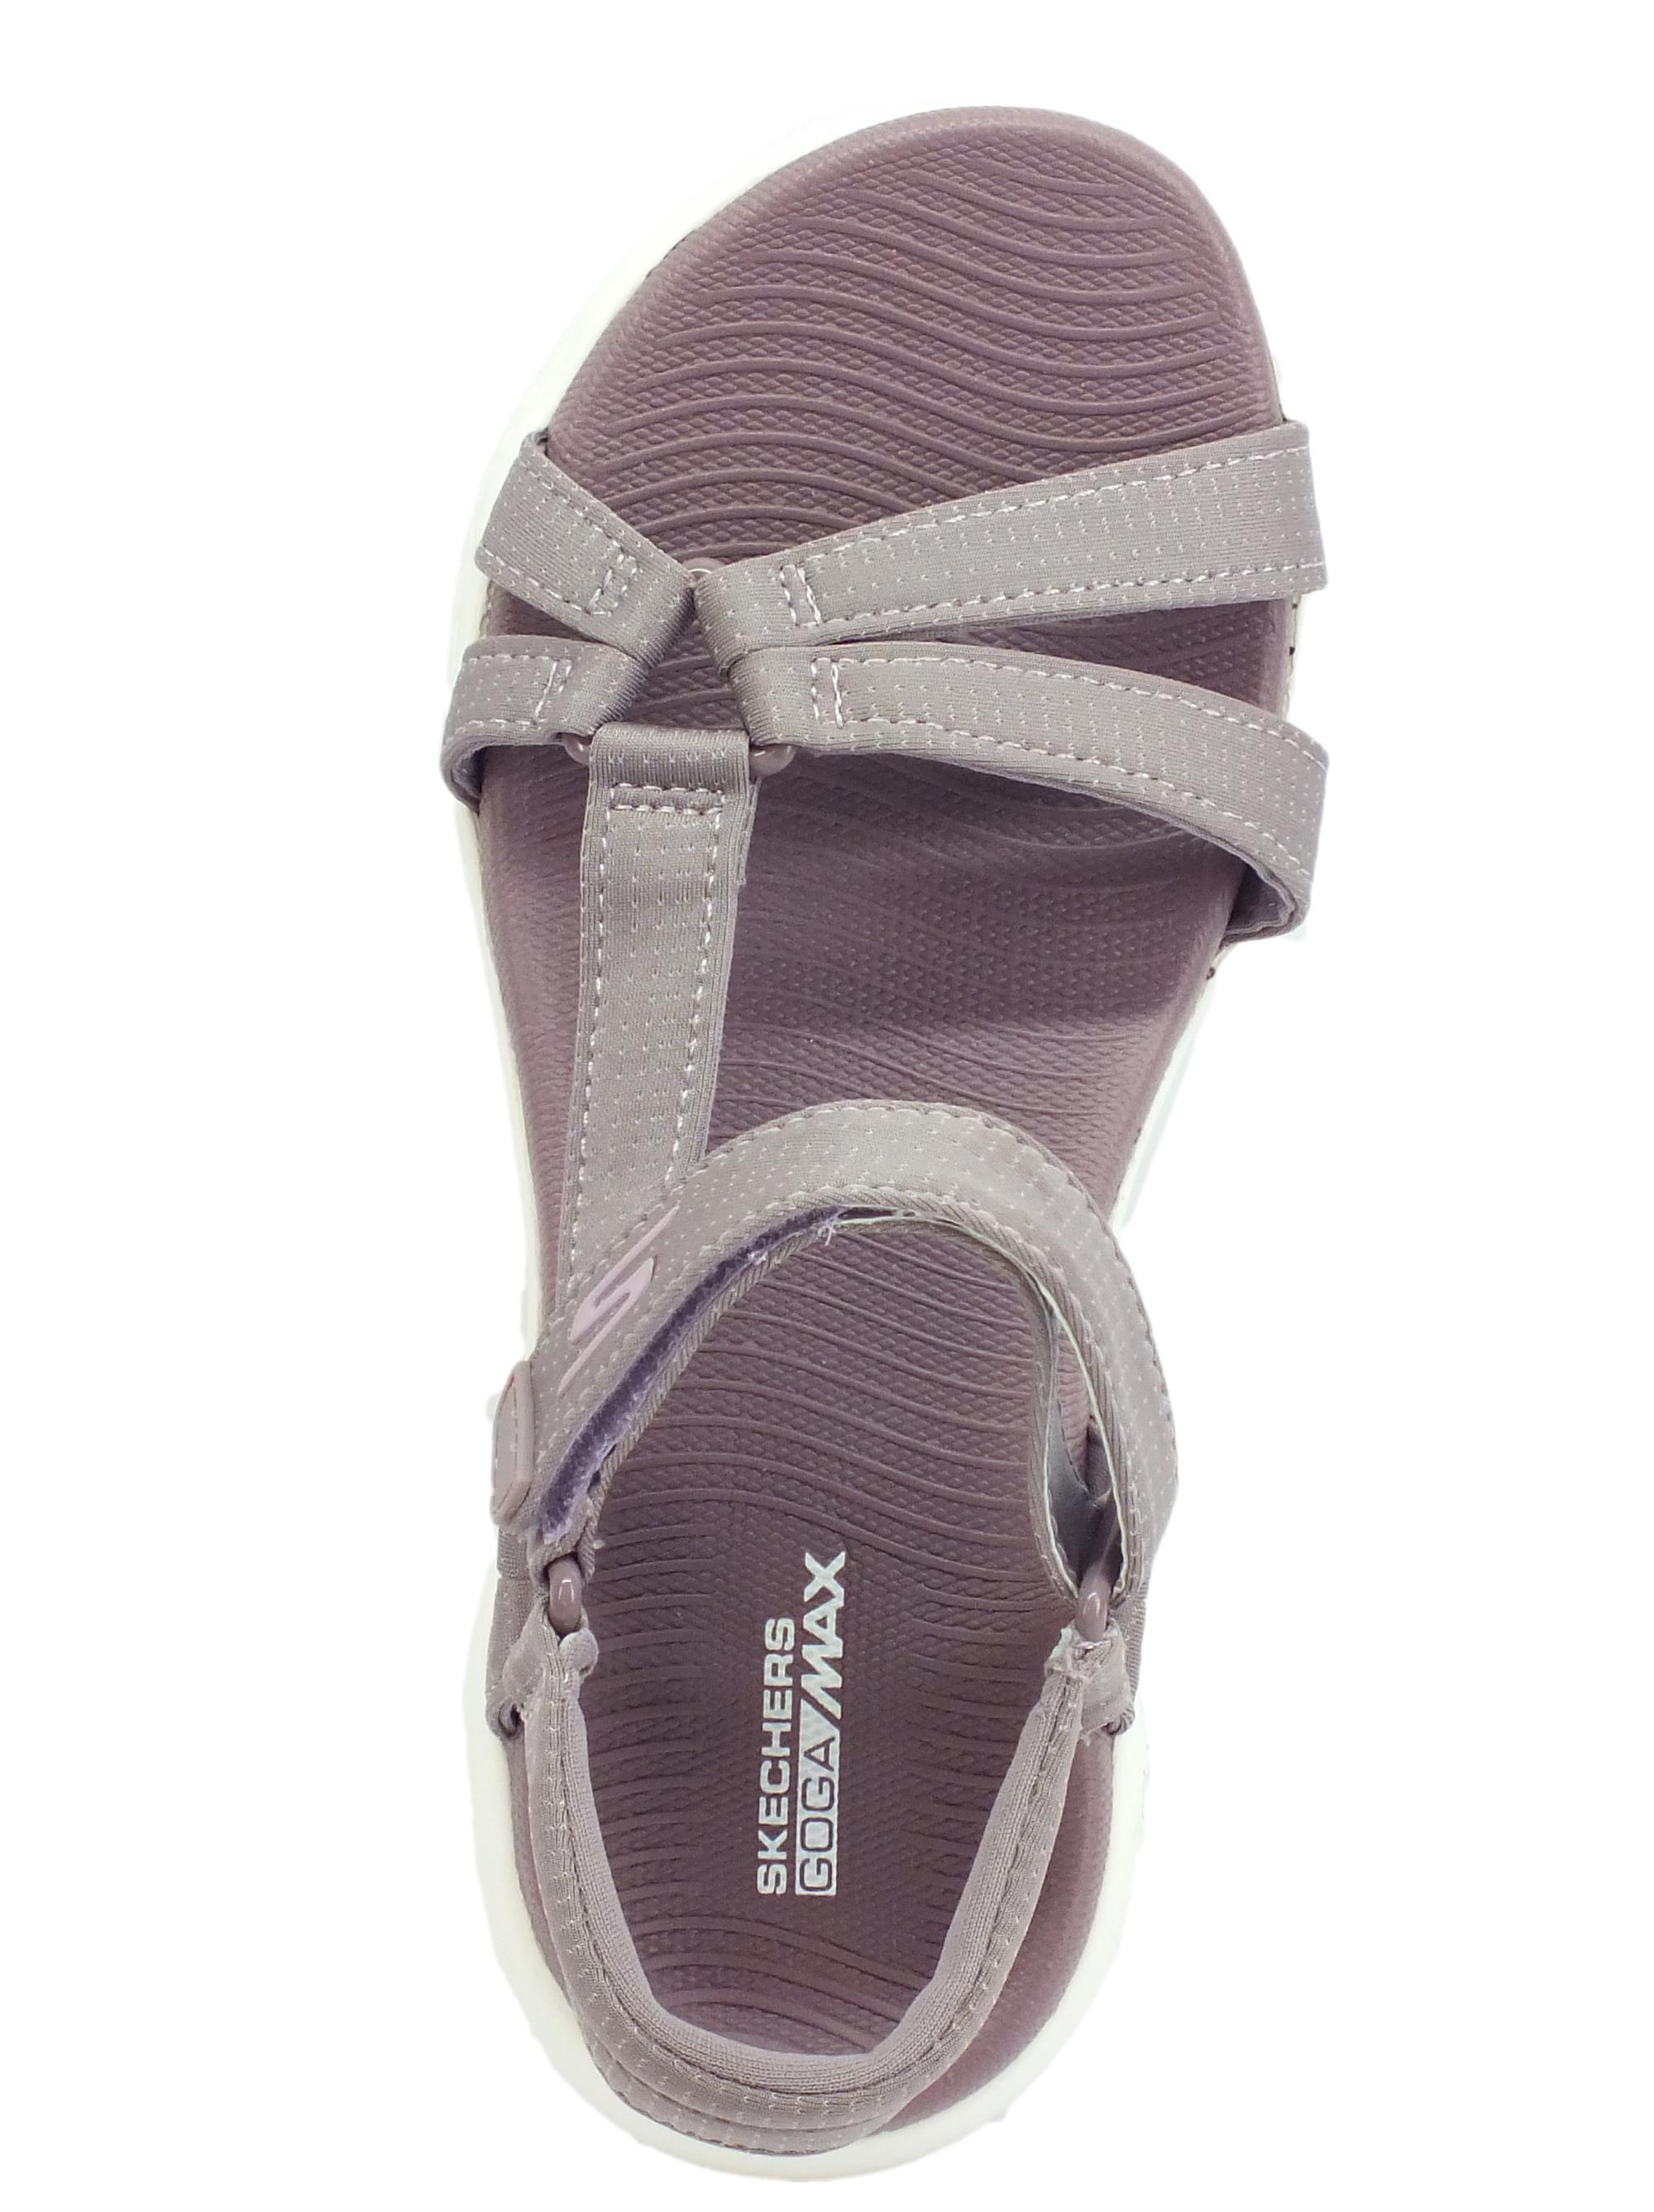 Skechers On The Go 600 Brillancy Light Mauve sandali sportivi per donna tessuto viola